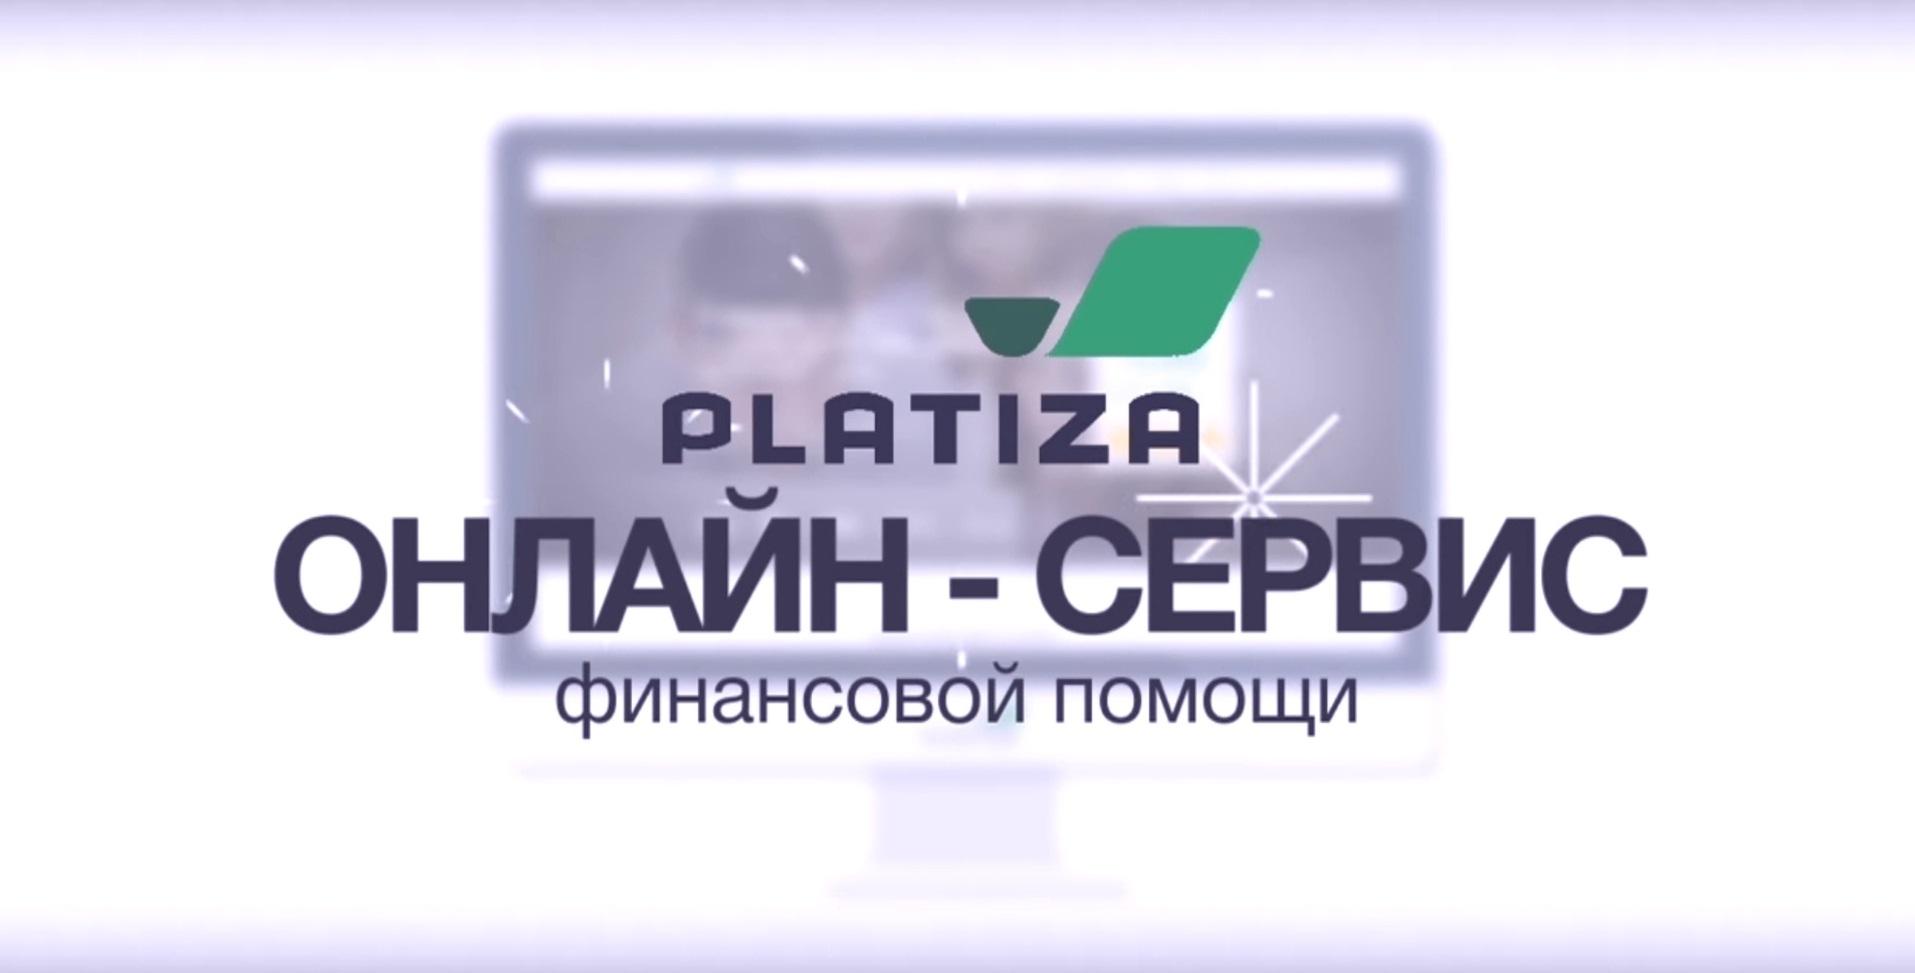 Platiza (Платиза) — Как оформить займ на QIWI онлайн?